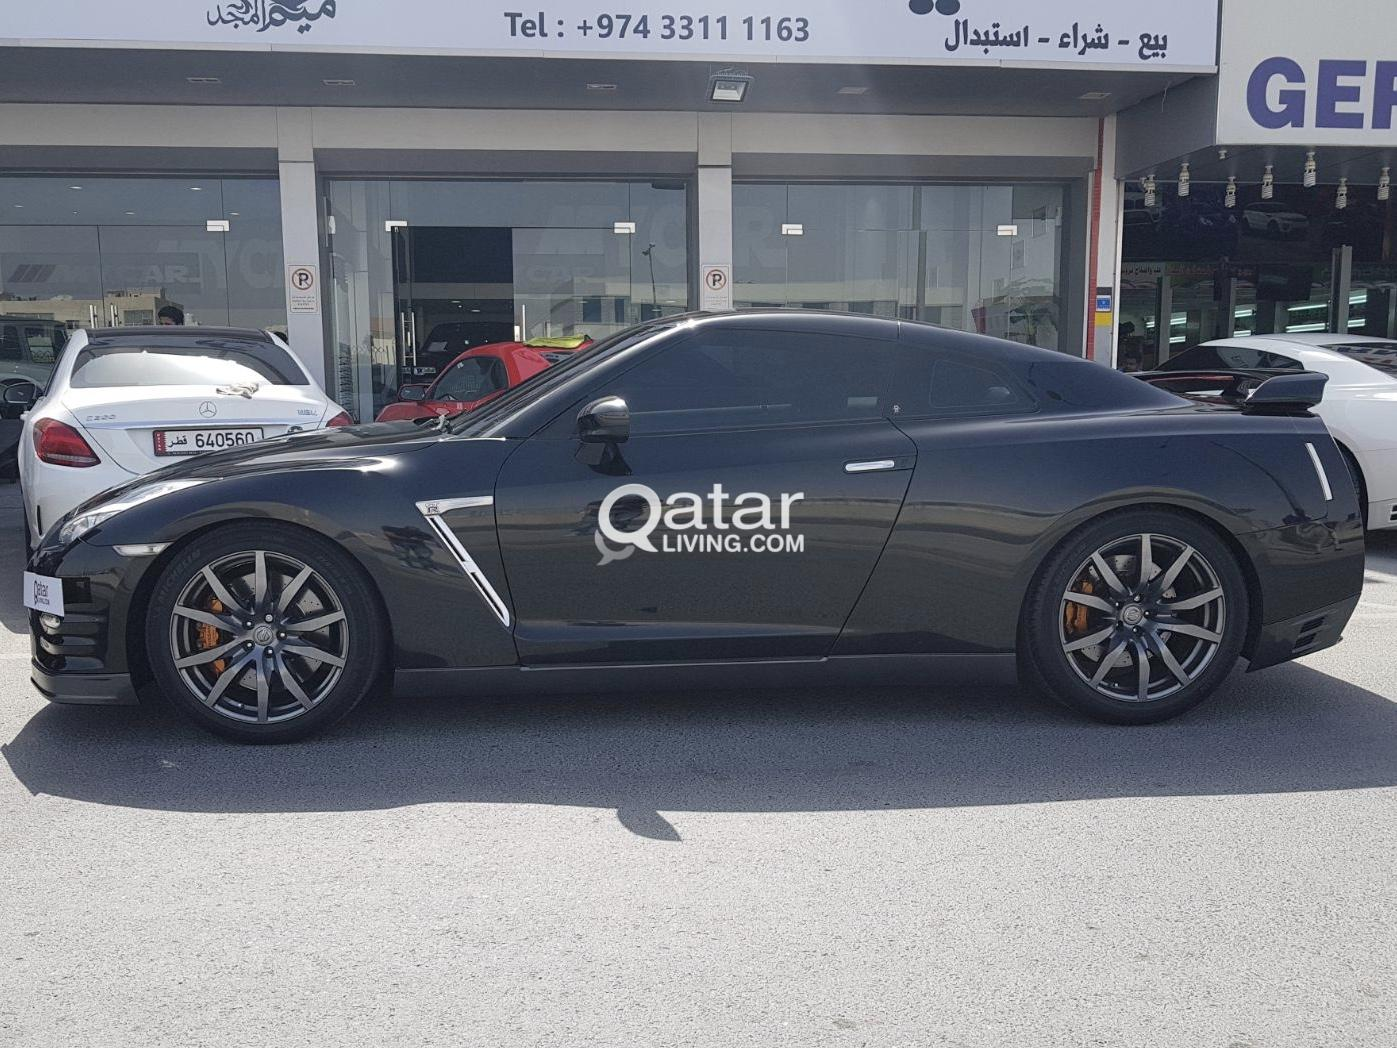 Nissan nissan gtr 2014 : Nissan GTR 2014 | Qatar Living